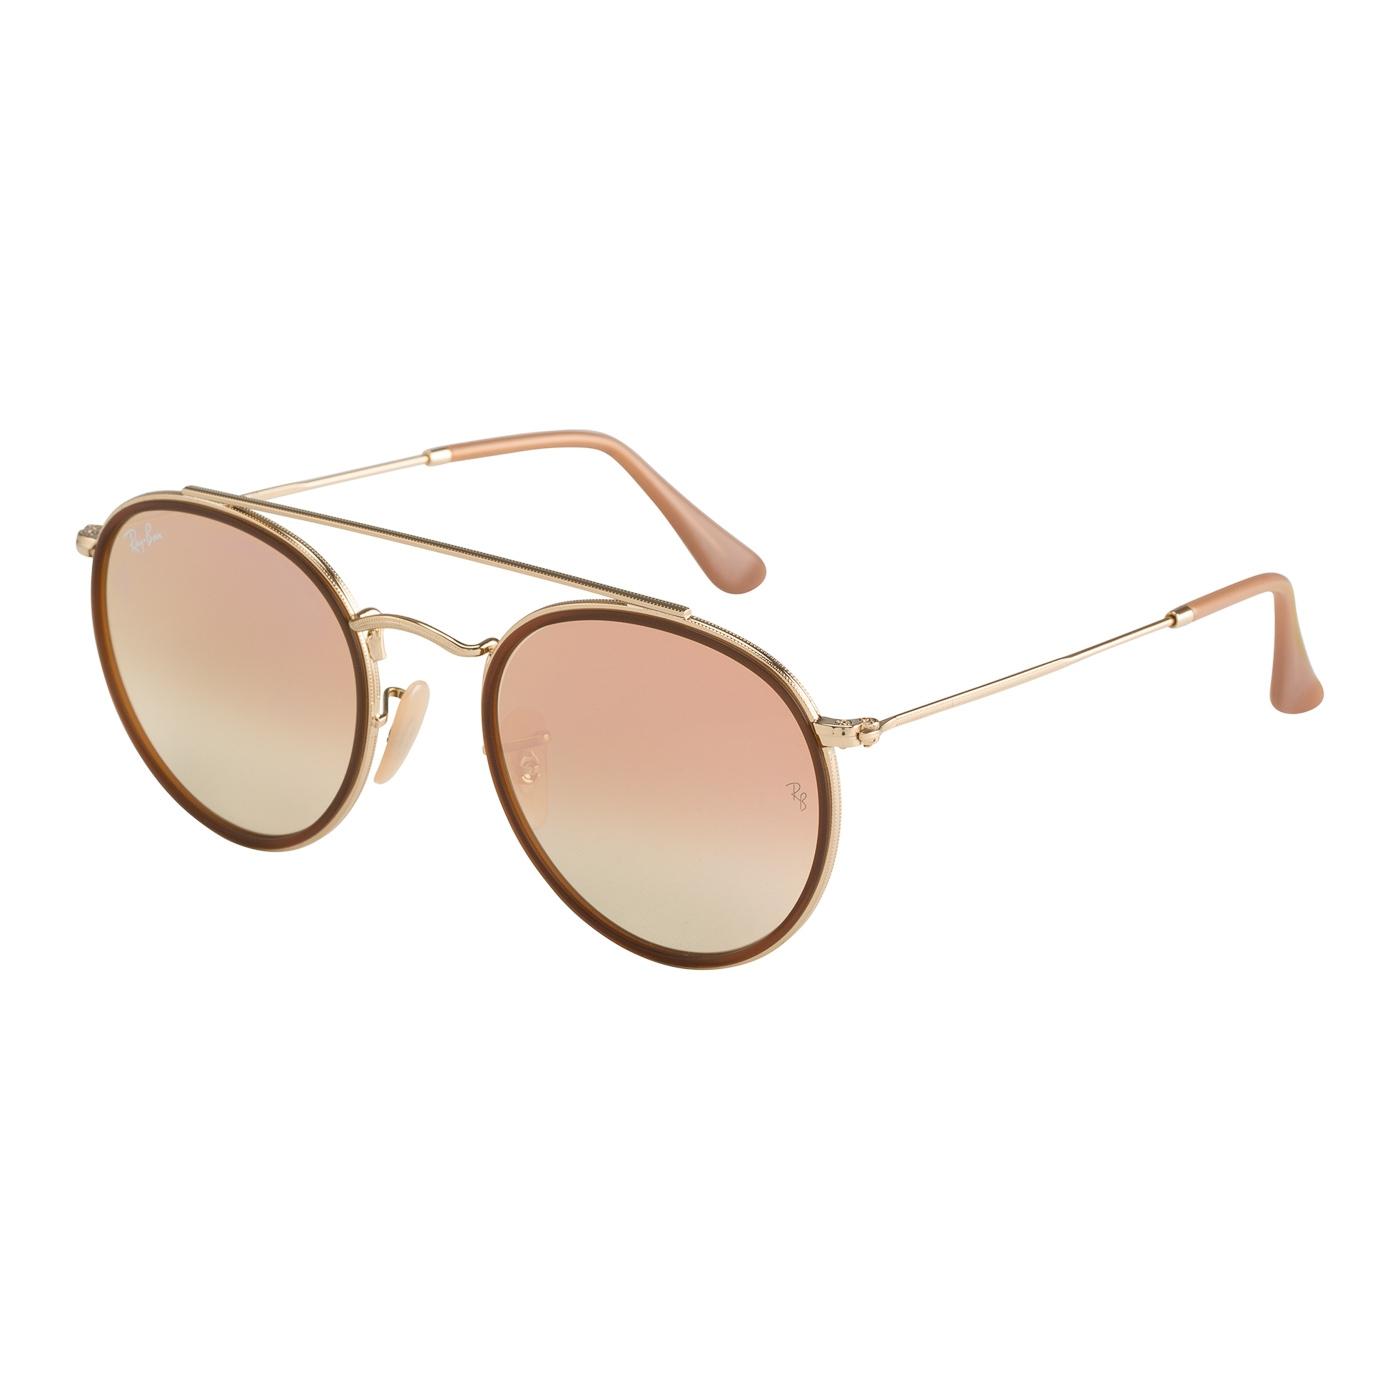 Aviator/rond lunettes de soleil RB3647N0017O51 - Ray-ban - Modalova